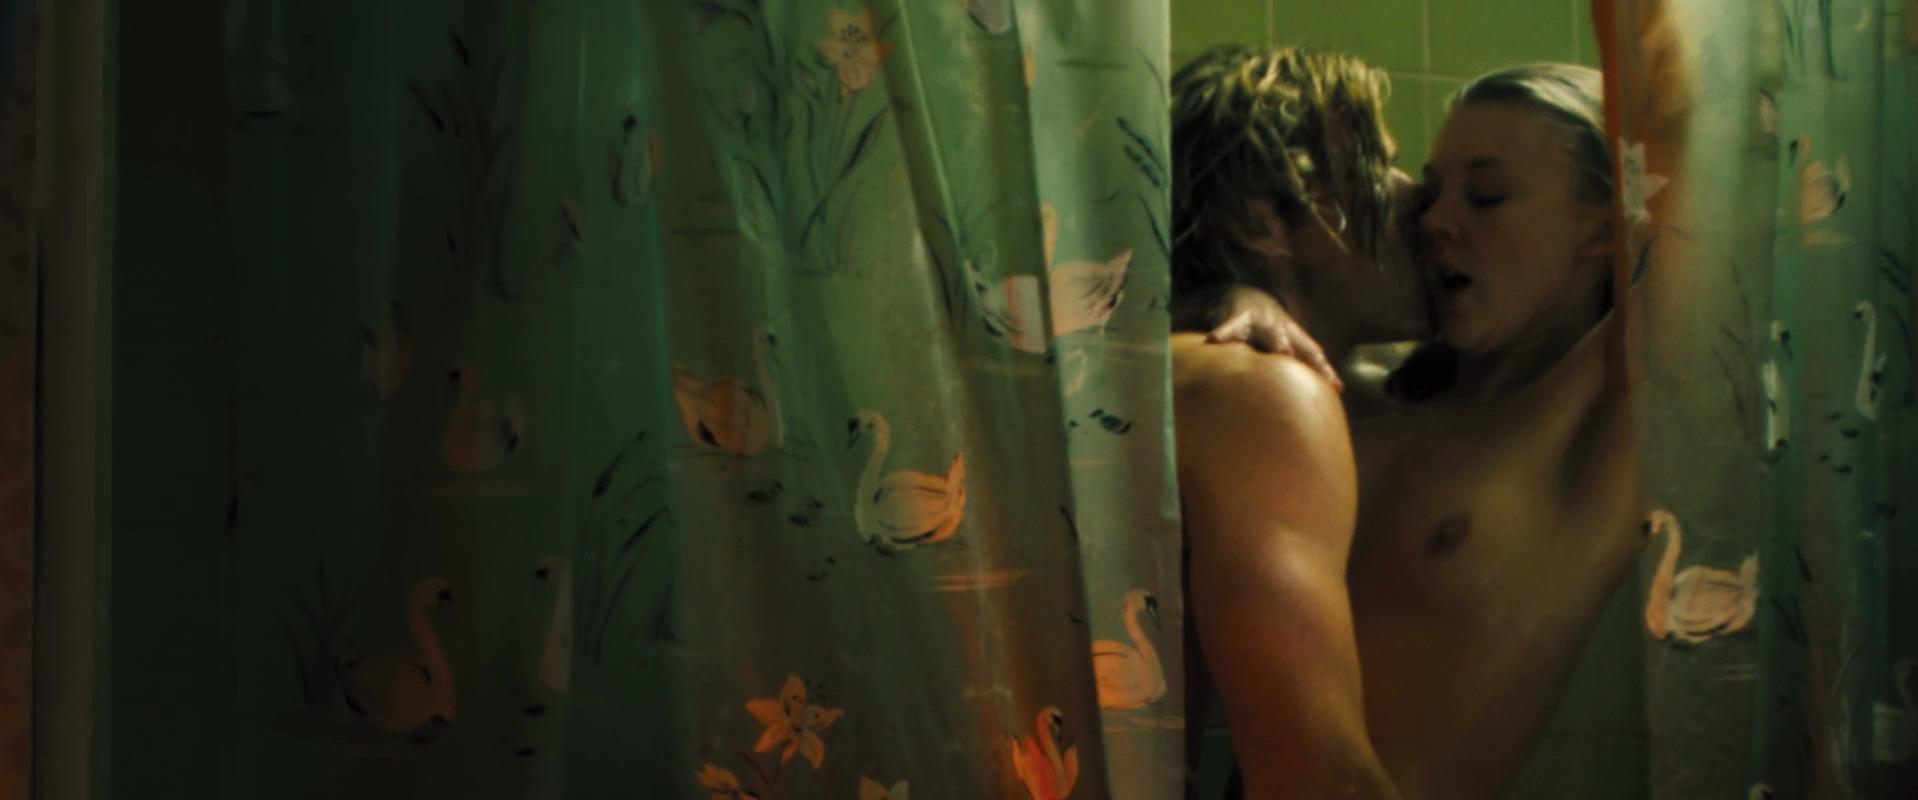 Natalie Dormer nude, Alexandra Maria Lara nude, Brooke Johnston nude - Rush (2013)